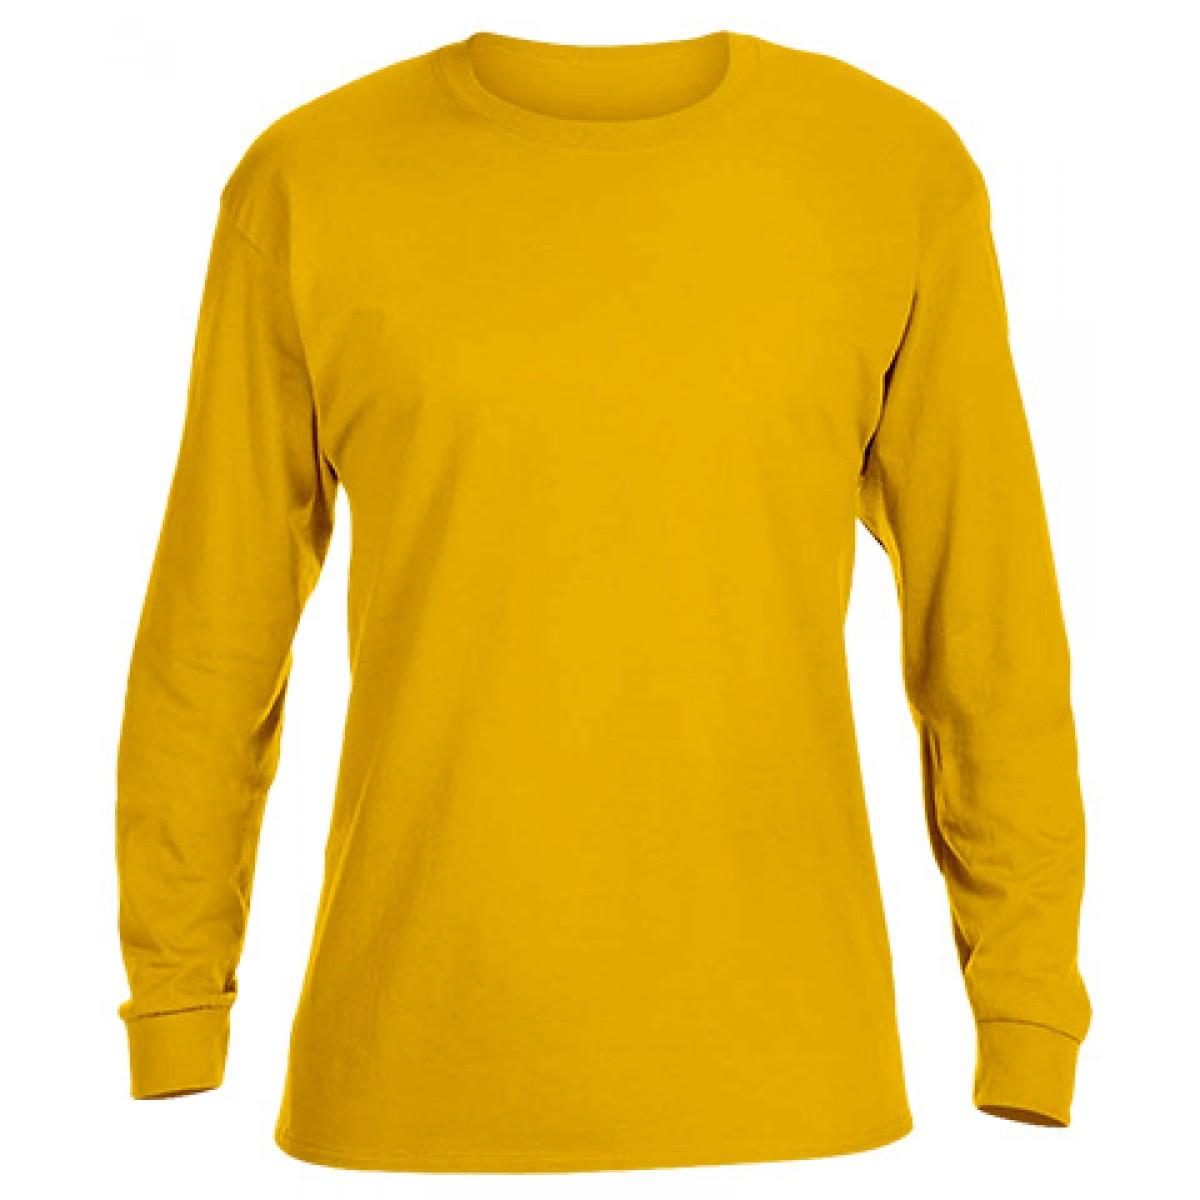 Heavy Cotton Long-Sleeve Adidas Shirt-Gold-L